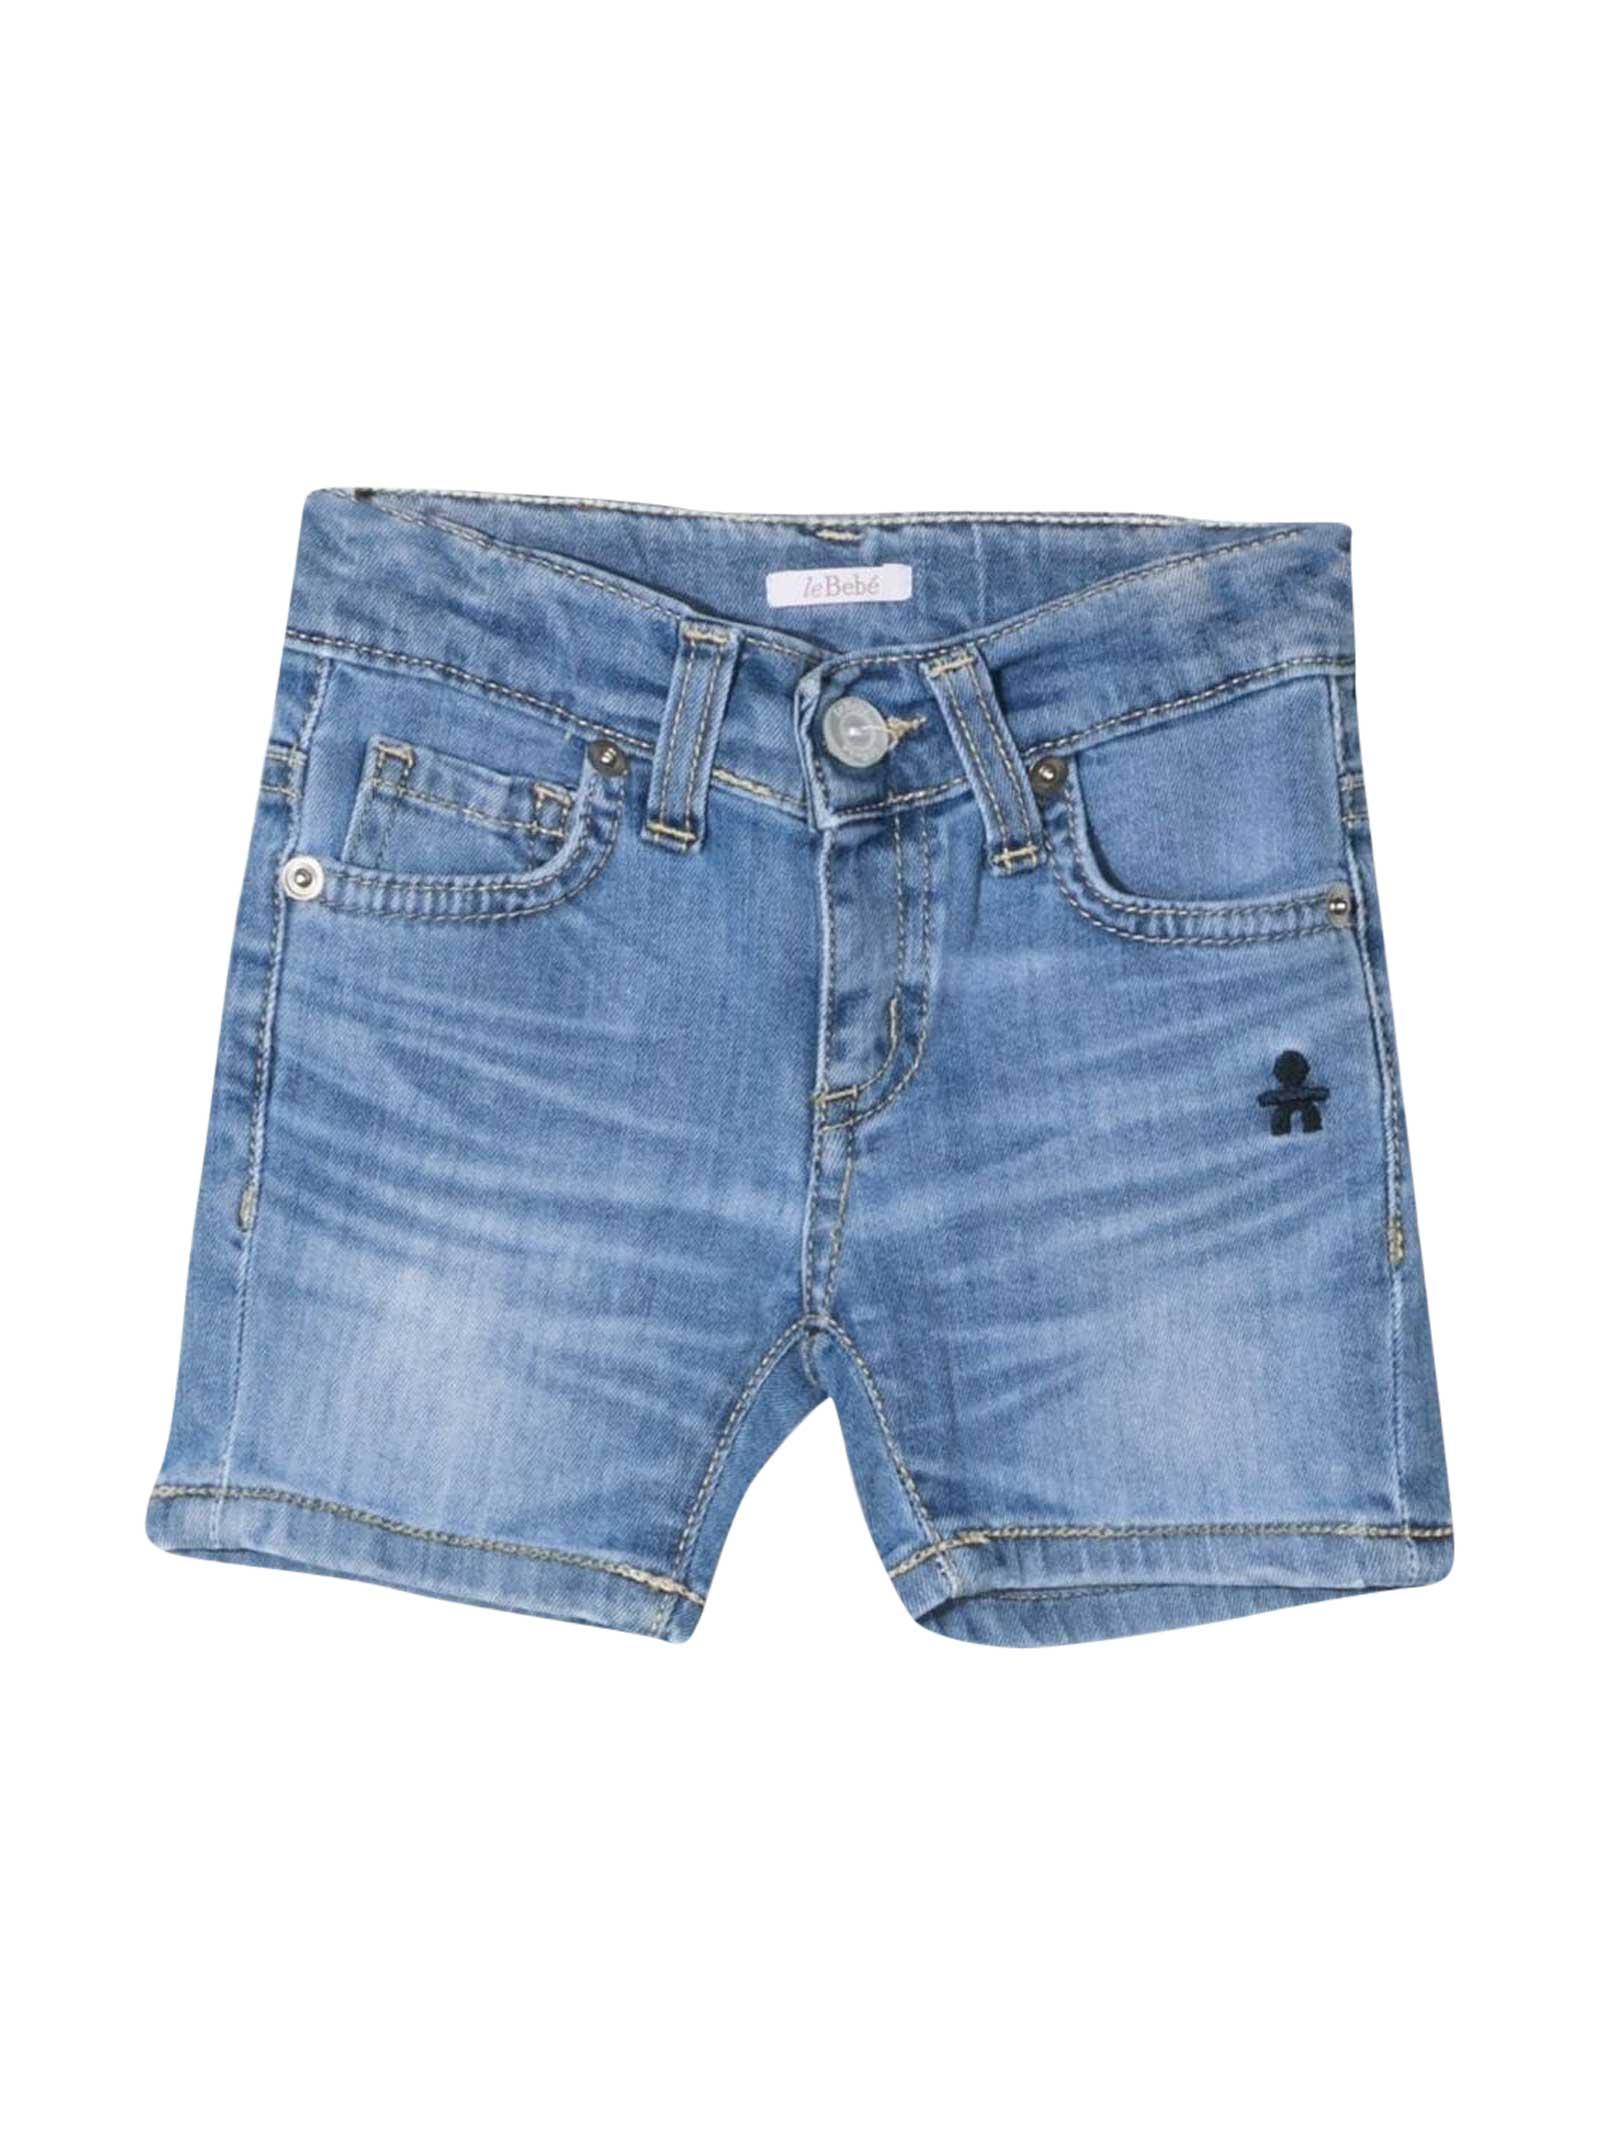 leBebé Denim Shorts With Embroidery